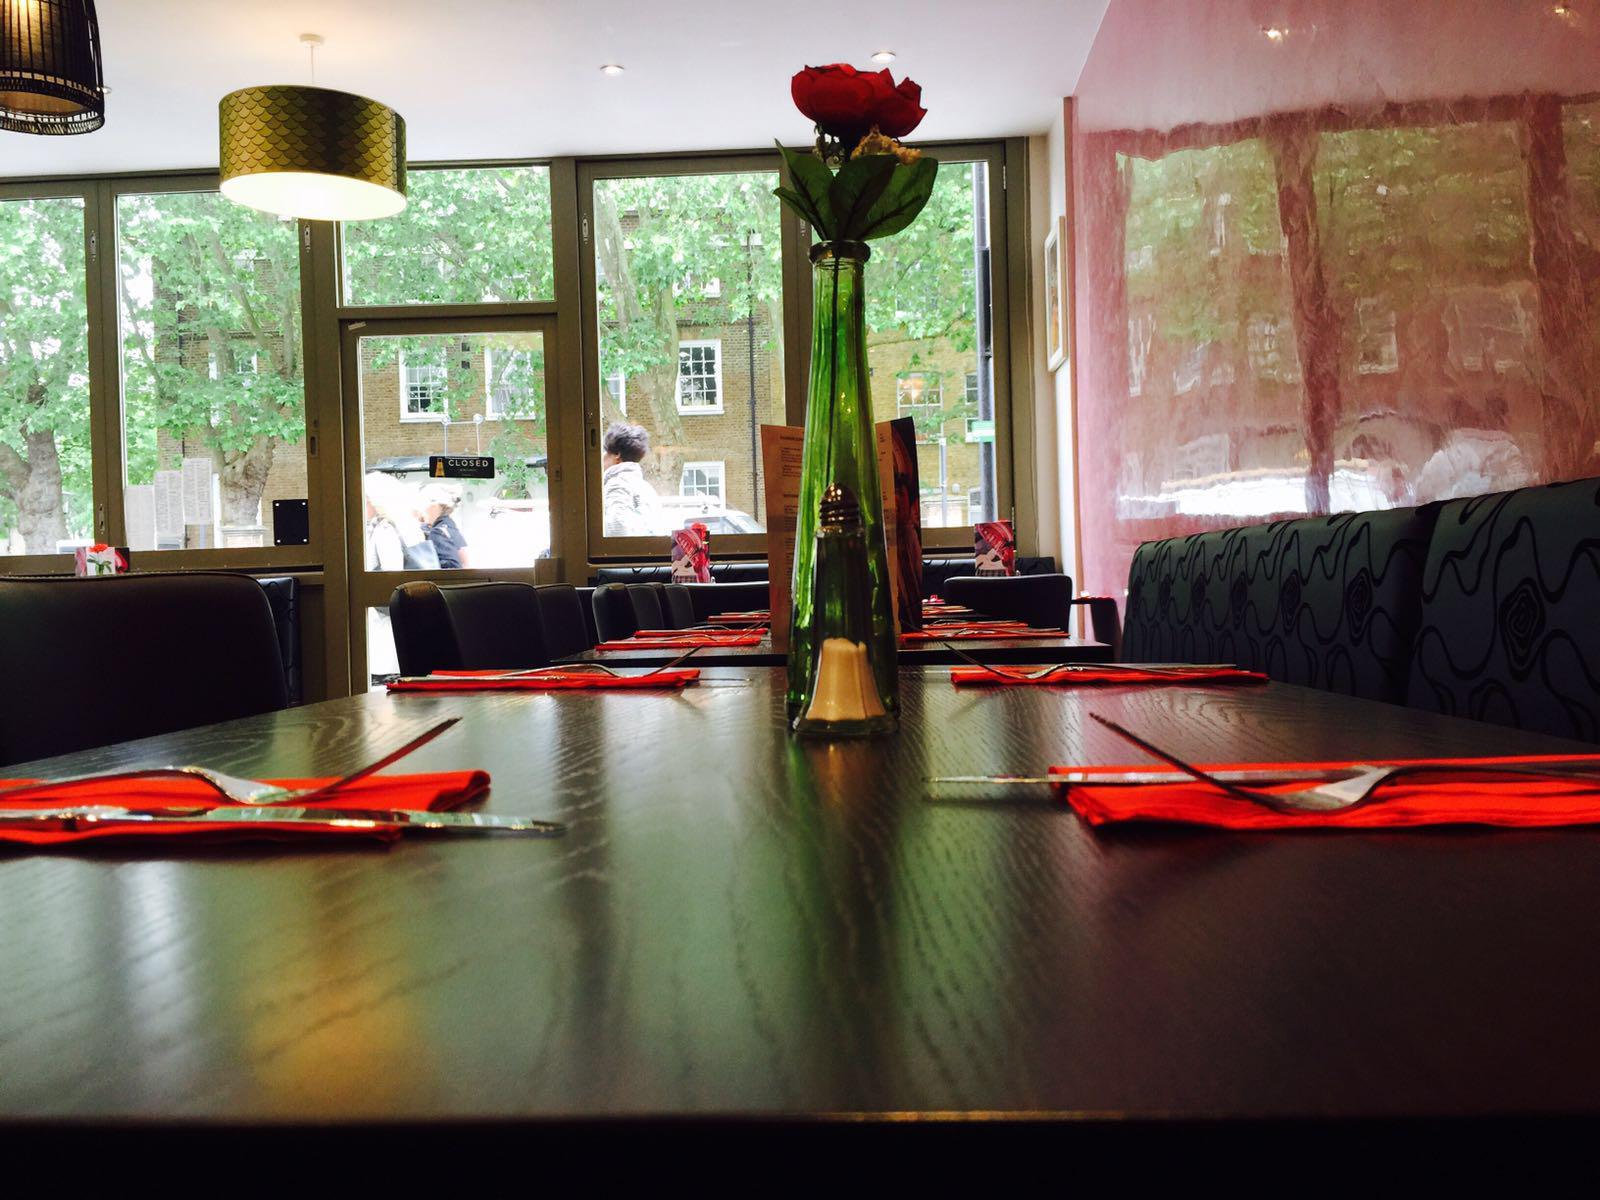 Gallery Image for Radha Krishna Bhavan an Indian Restaurant & Takeaway in Tooting